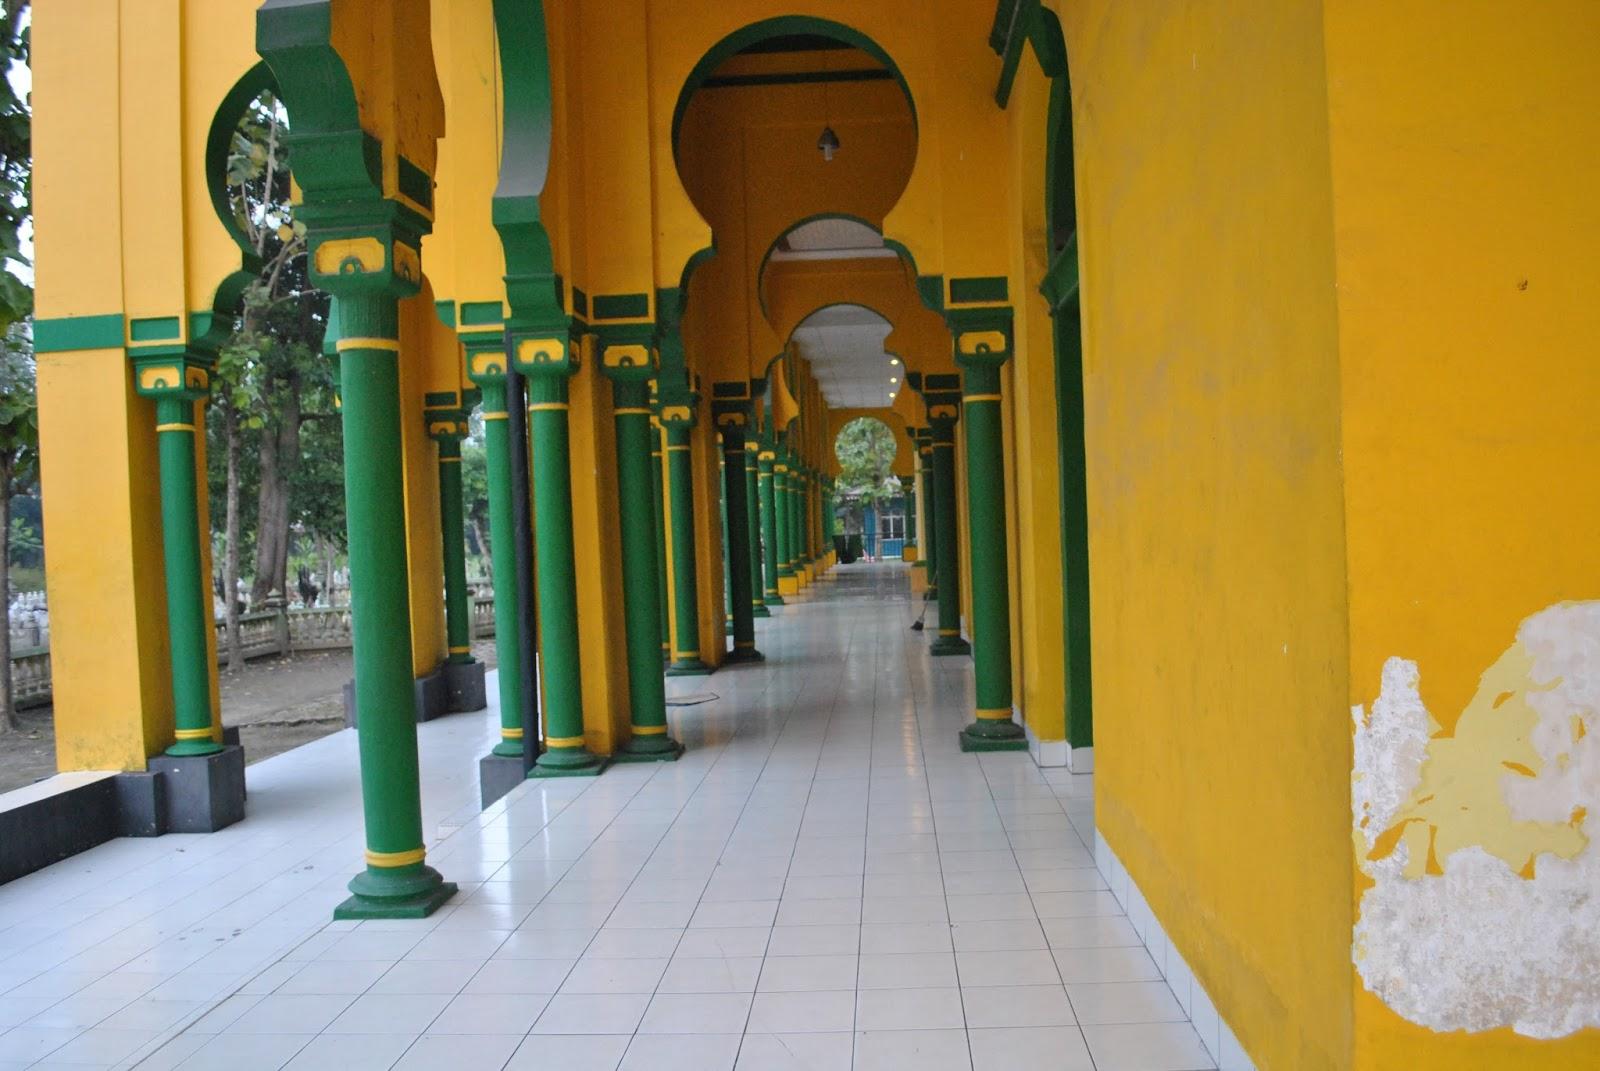 Masjid Tertua Kota Medan Mesjid Al Osmani Sisi Samping